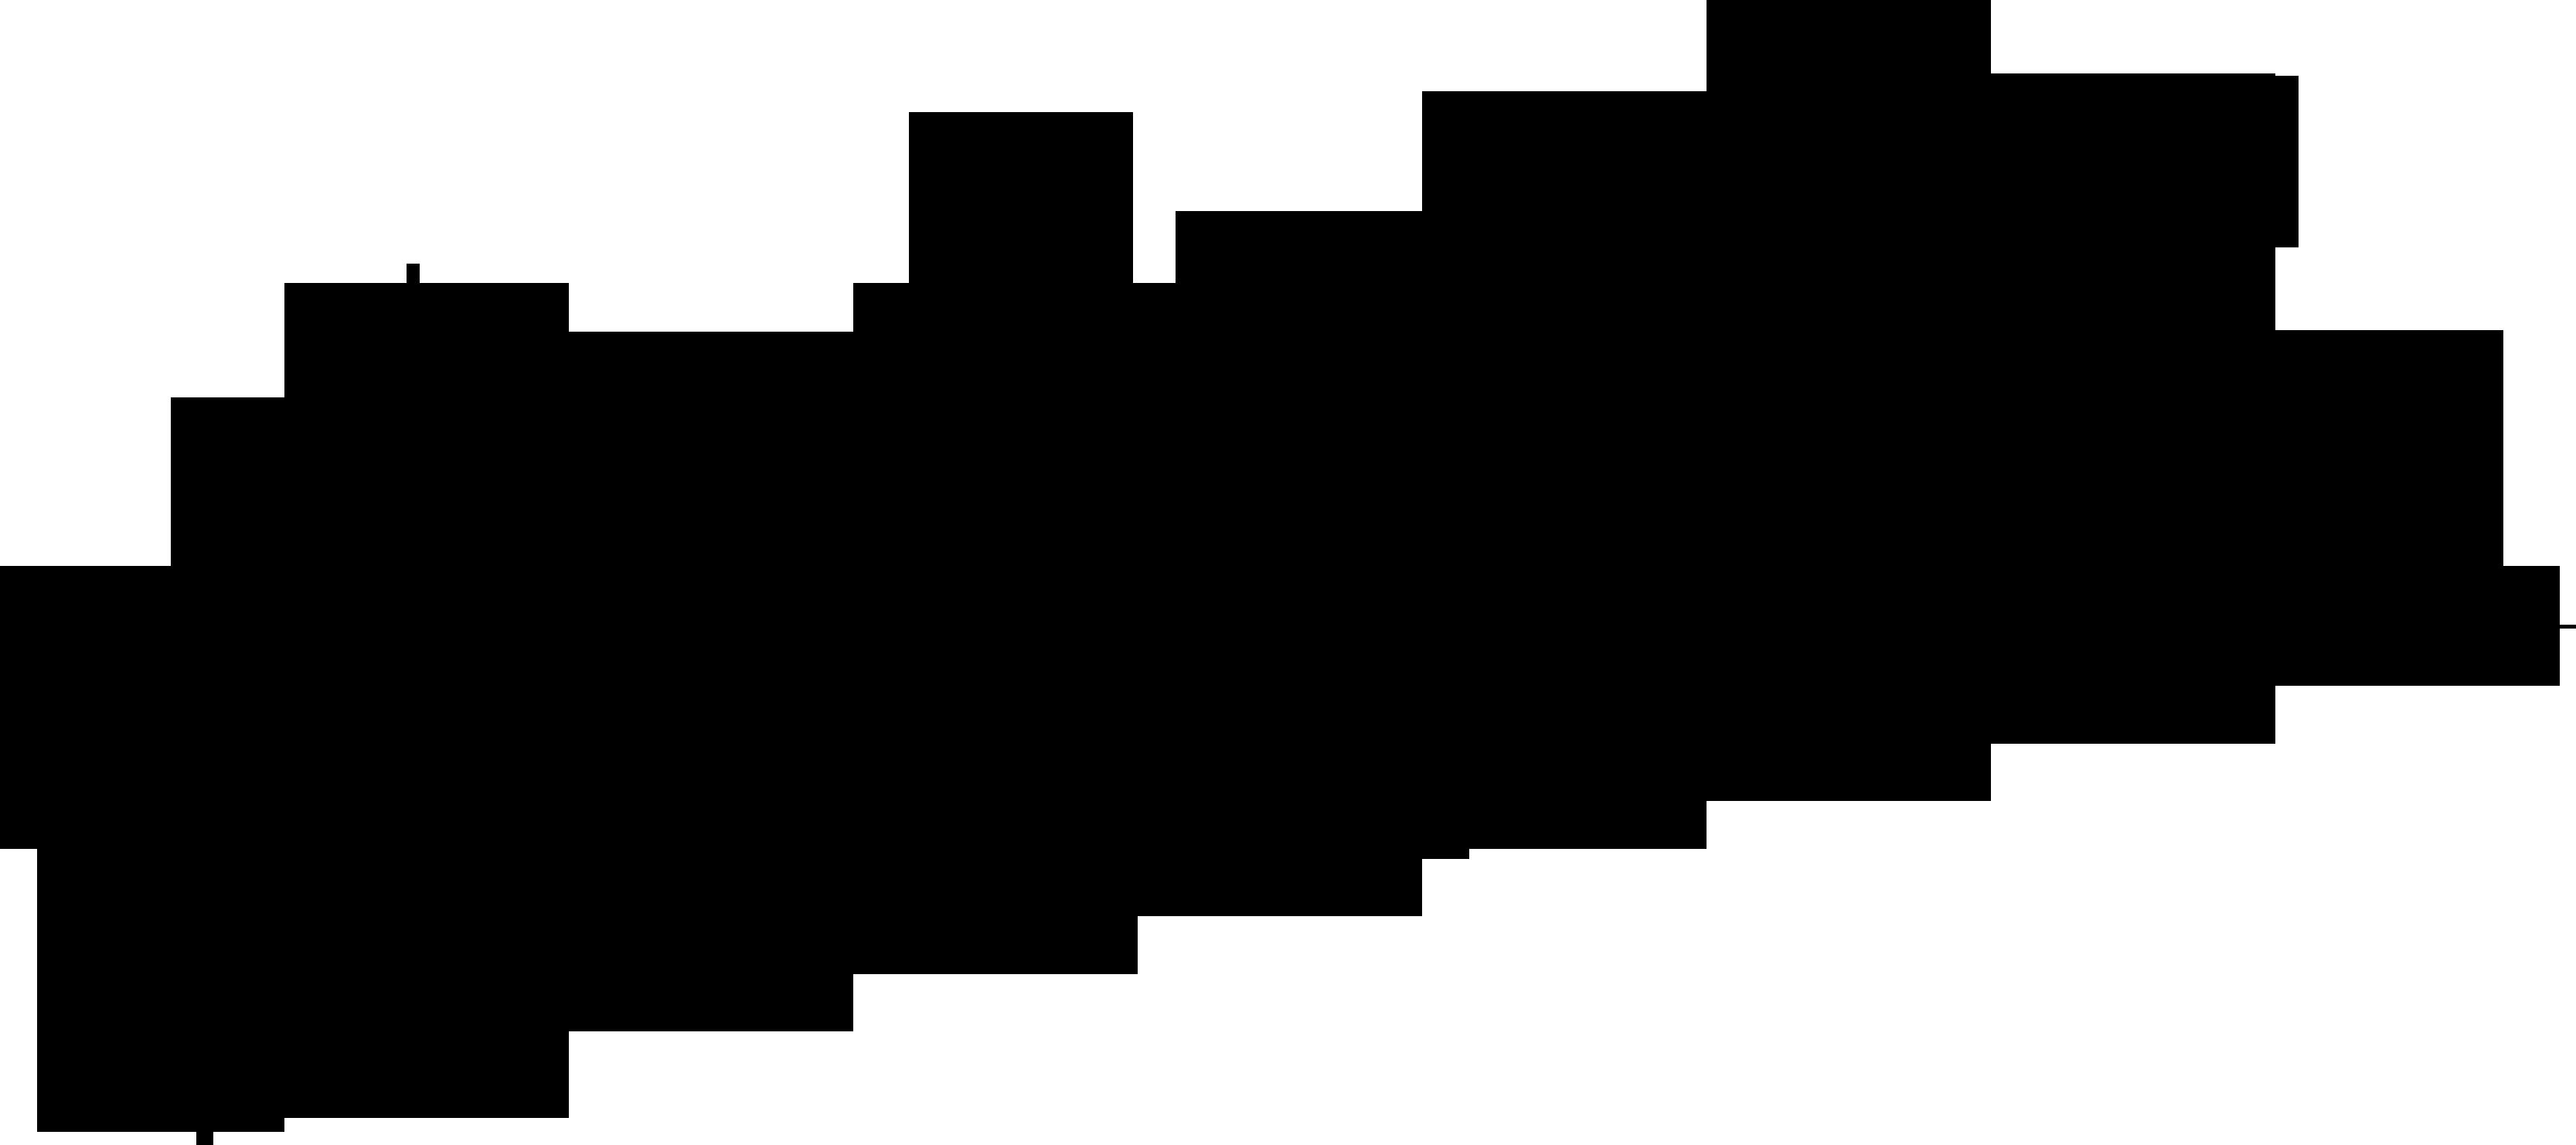 Logo final trnsprnt bg. Clean clipart spotless